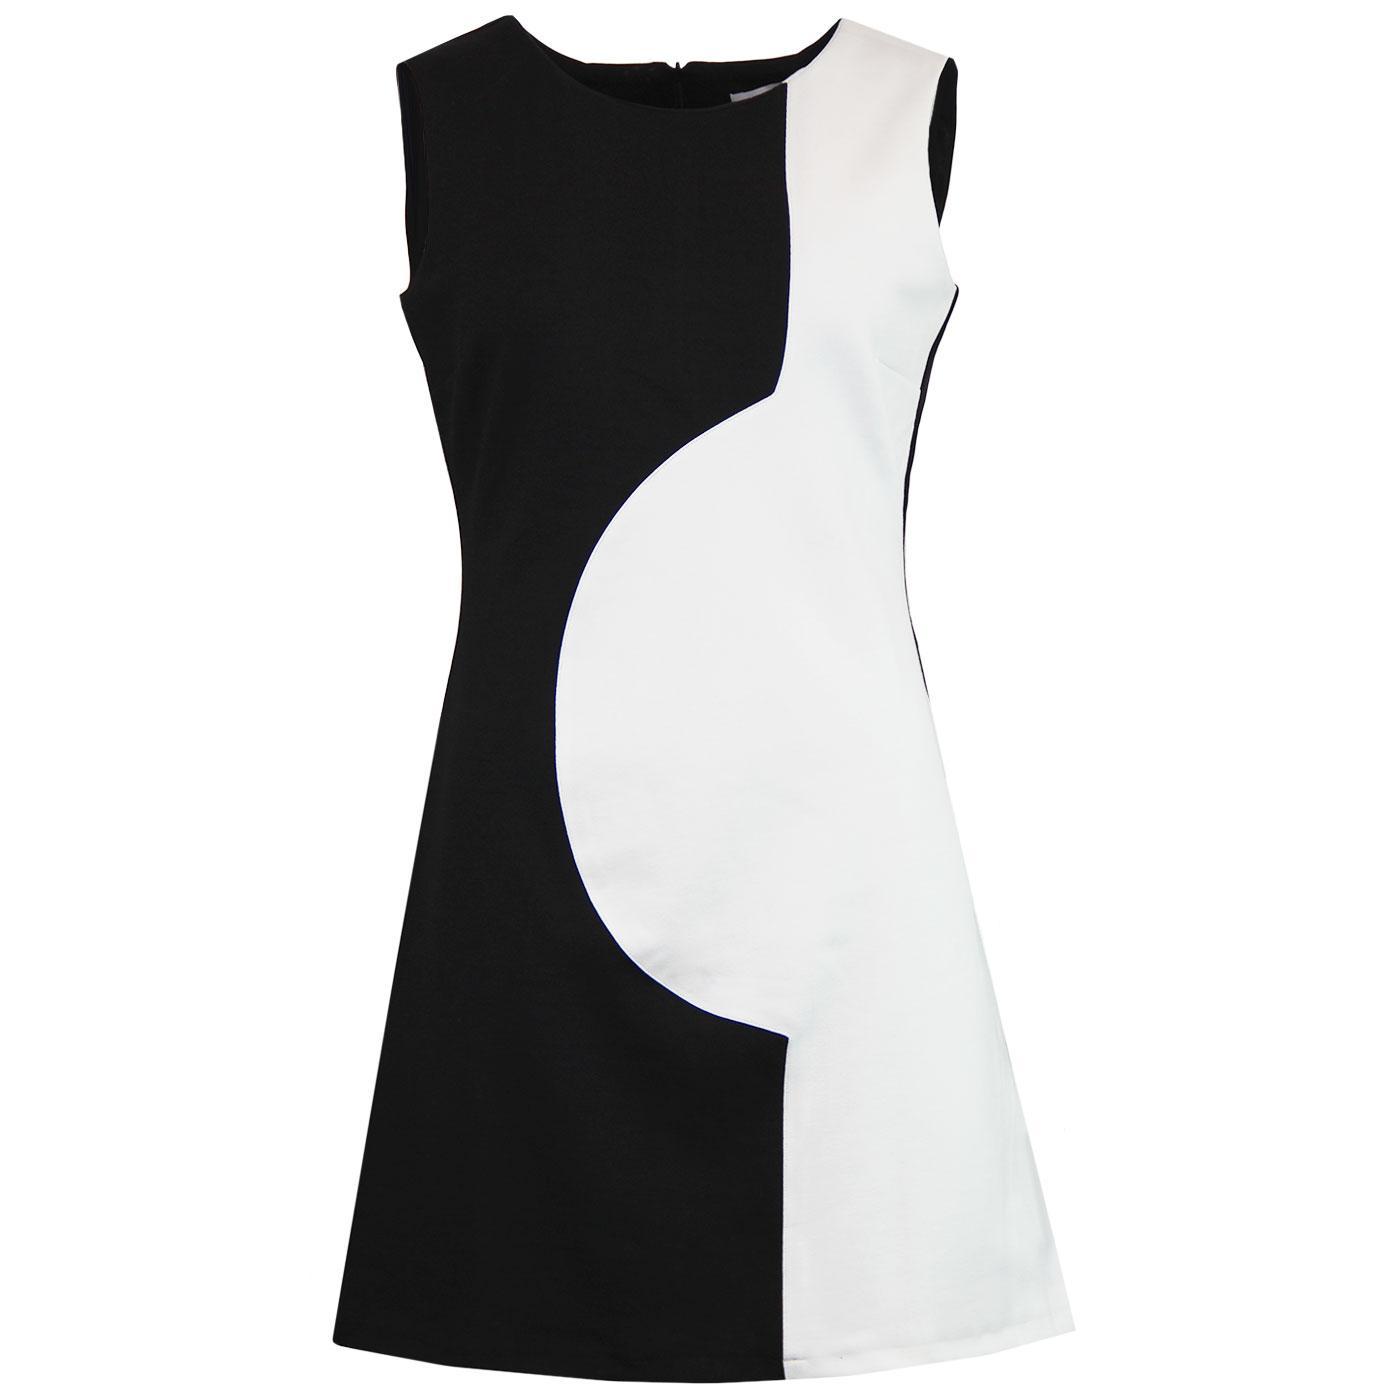 Golightly MADCAP ENGLAND 60s Mod Two Tone Dress